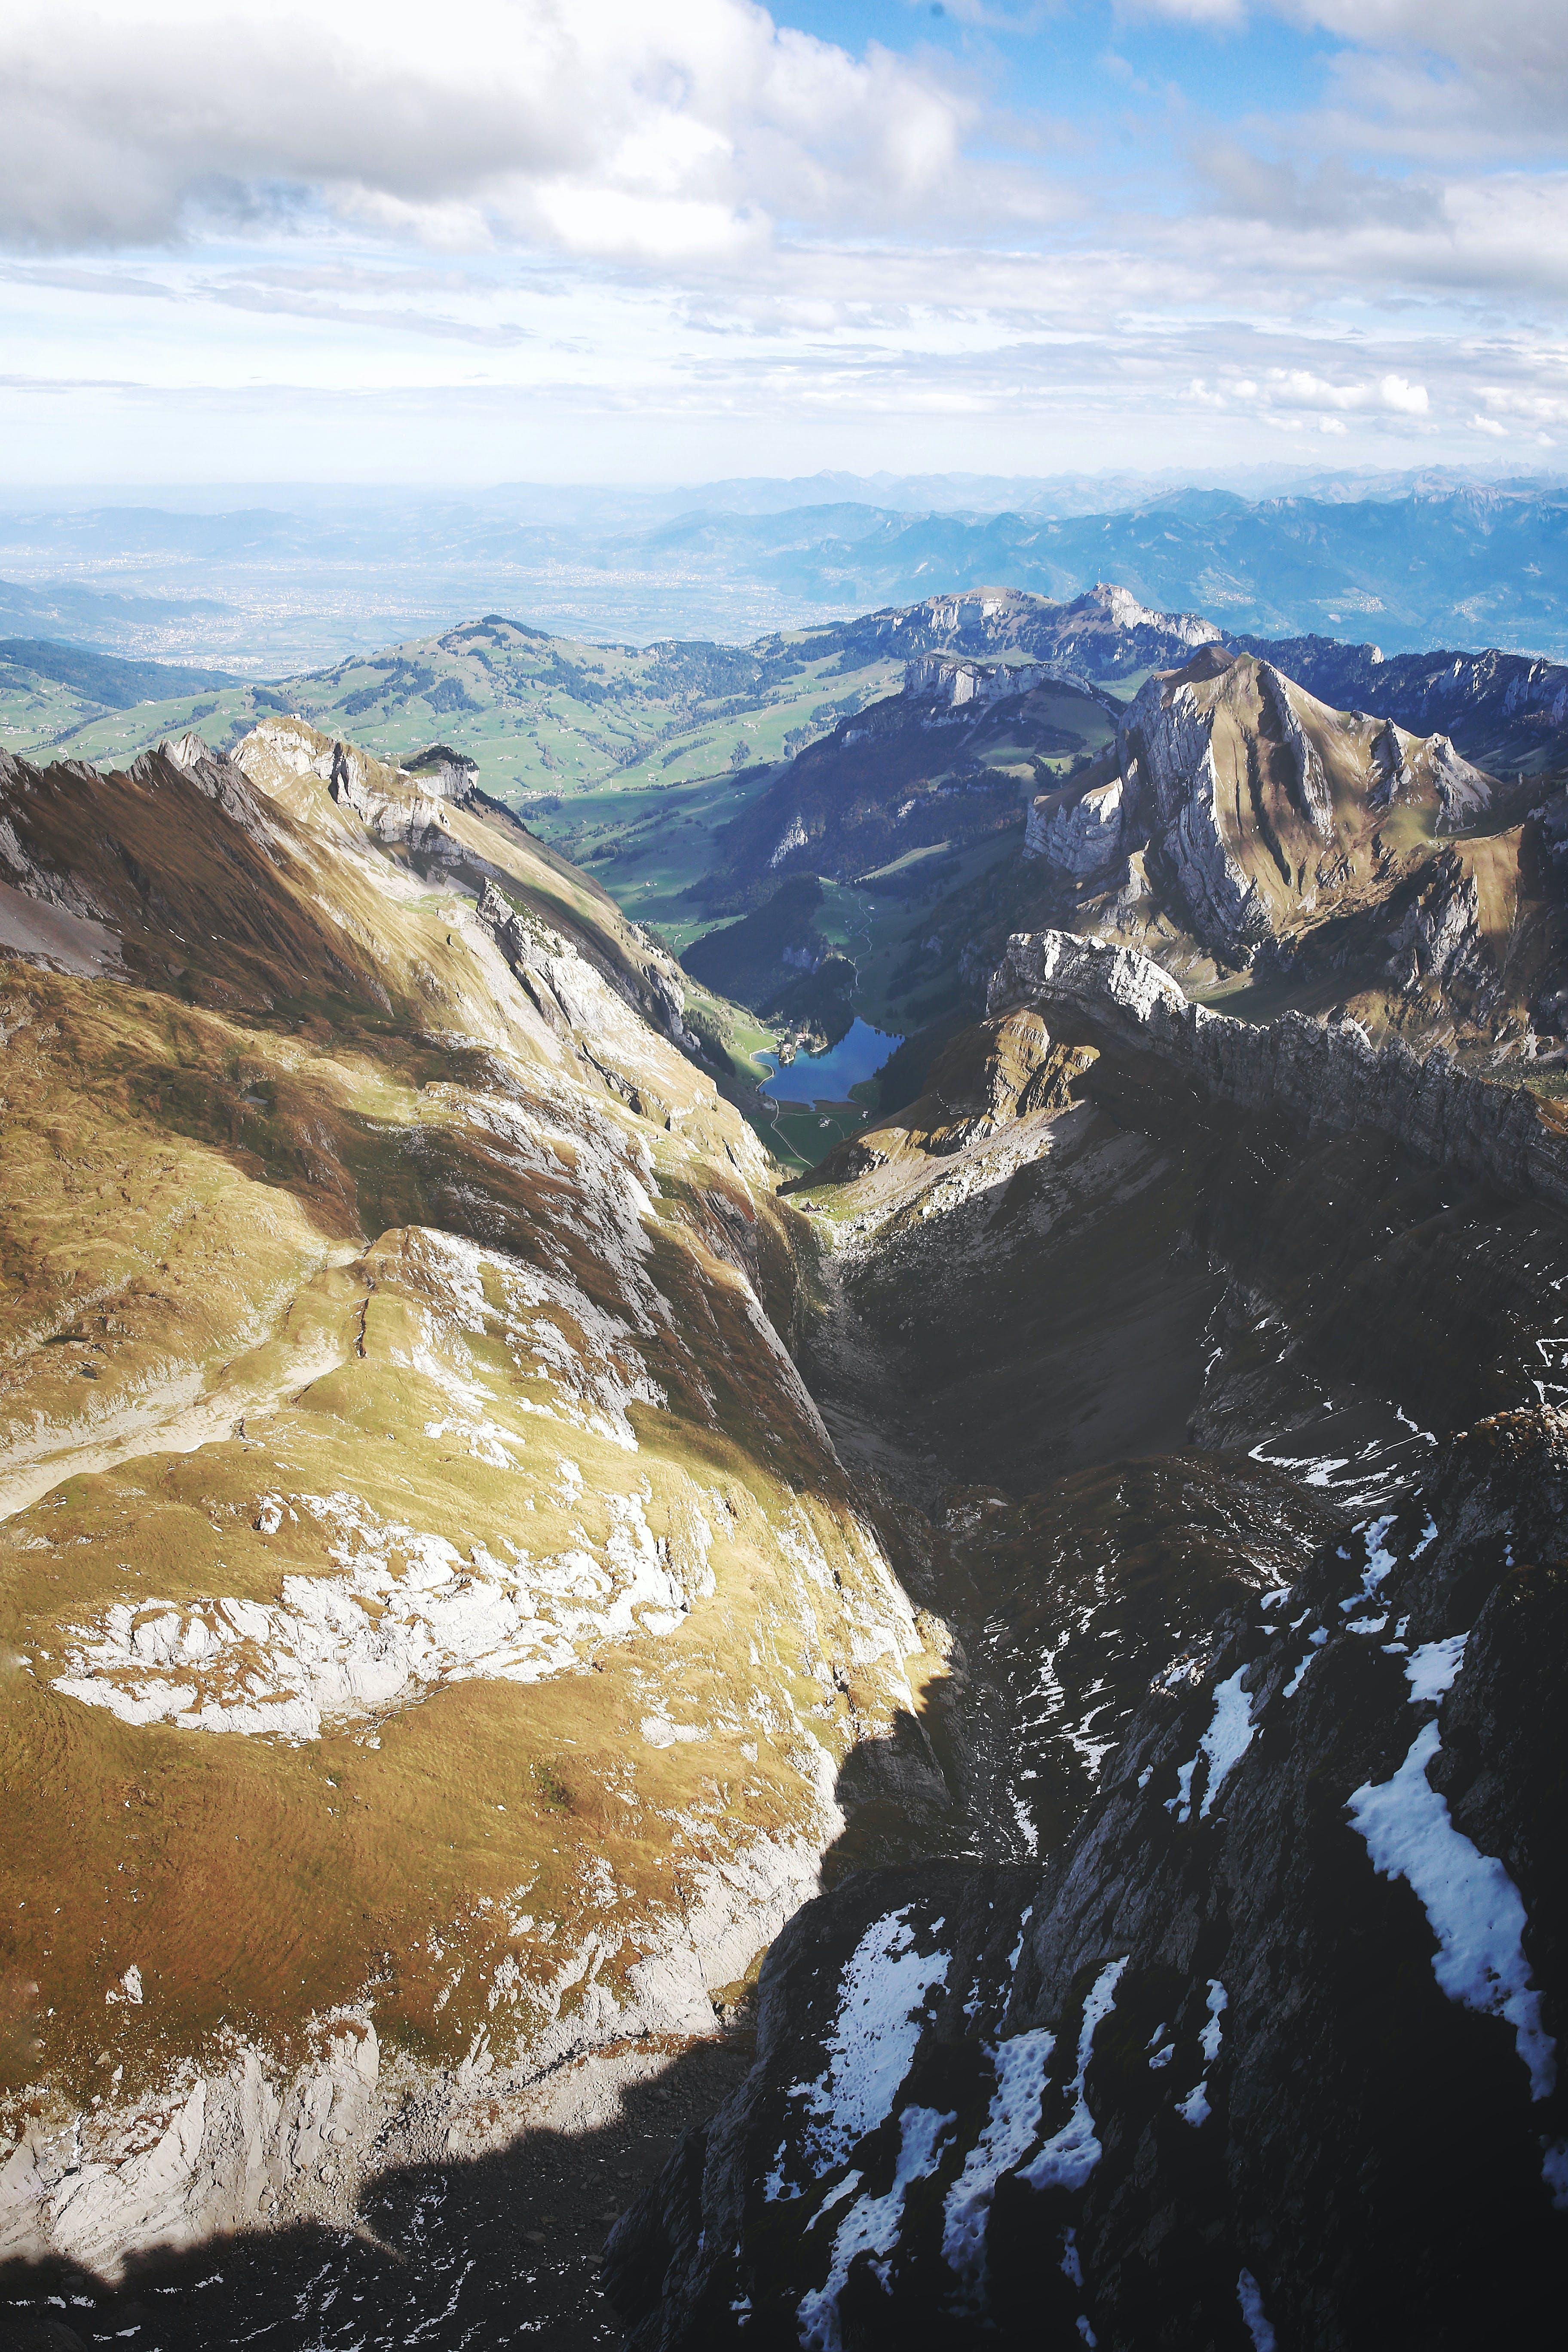 Bird's Eye View Of Rocky Mountains